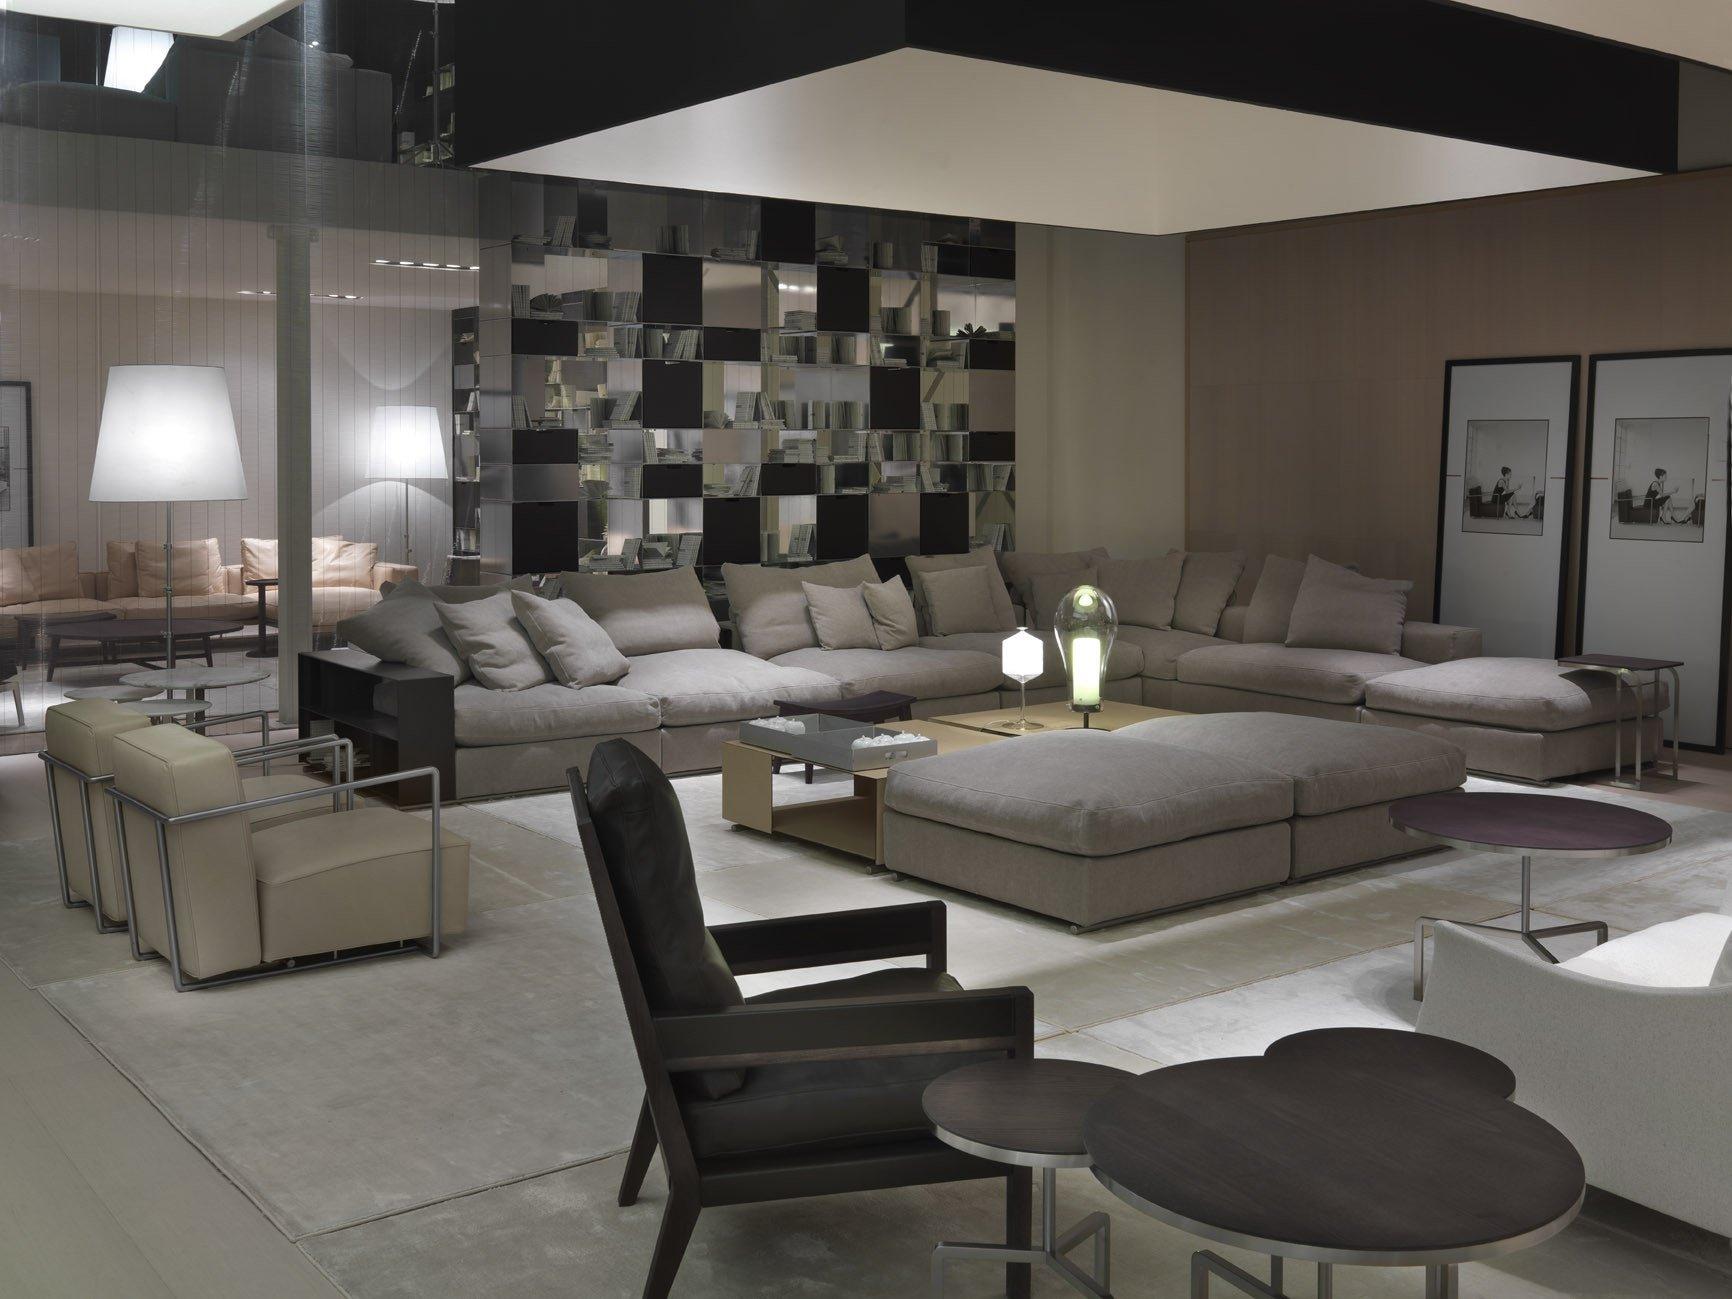 Flexform furniture store mornata arredamenti for Divani flexform outlet